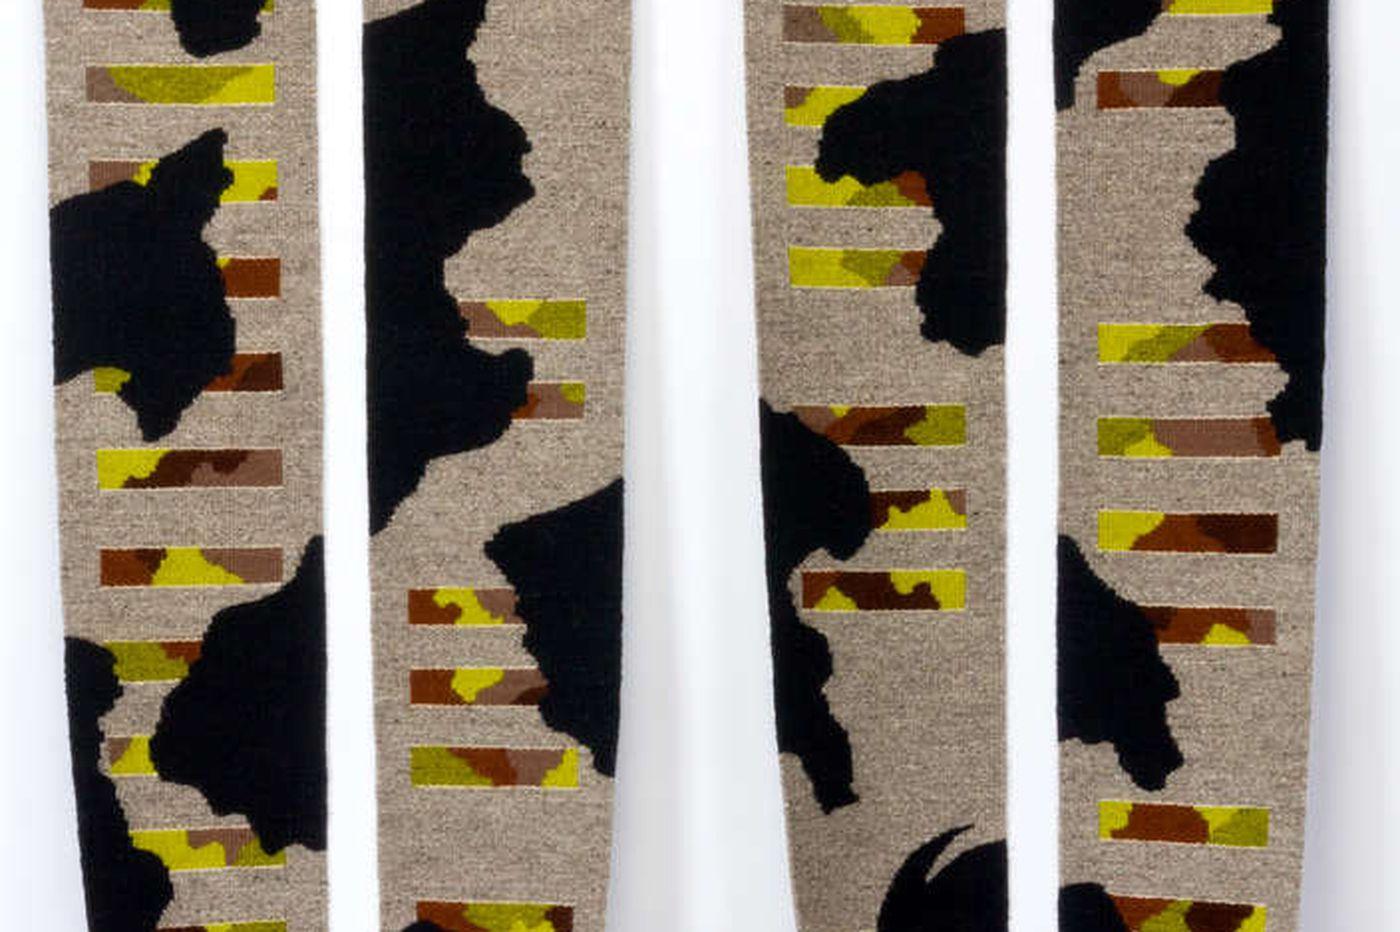 Snyderman hosts a classic in fiber art.